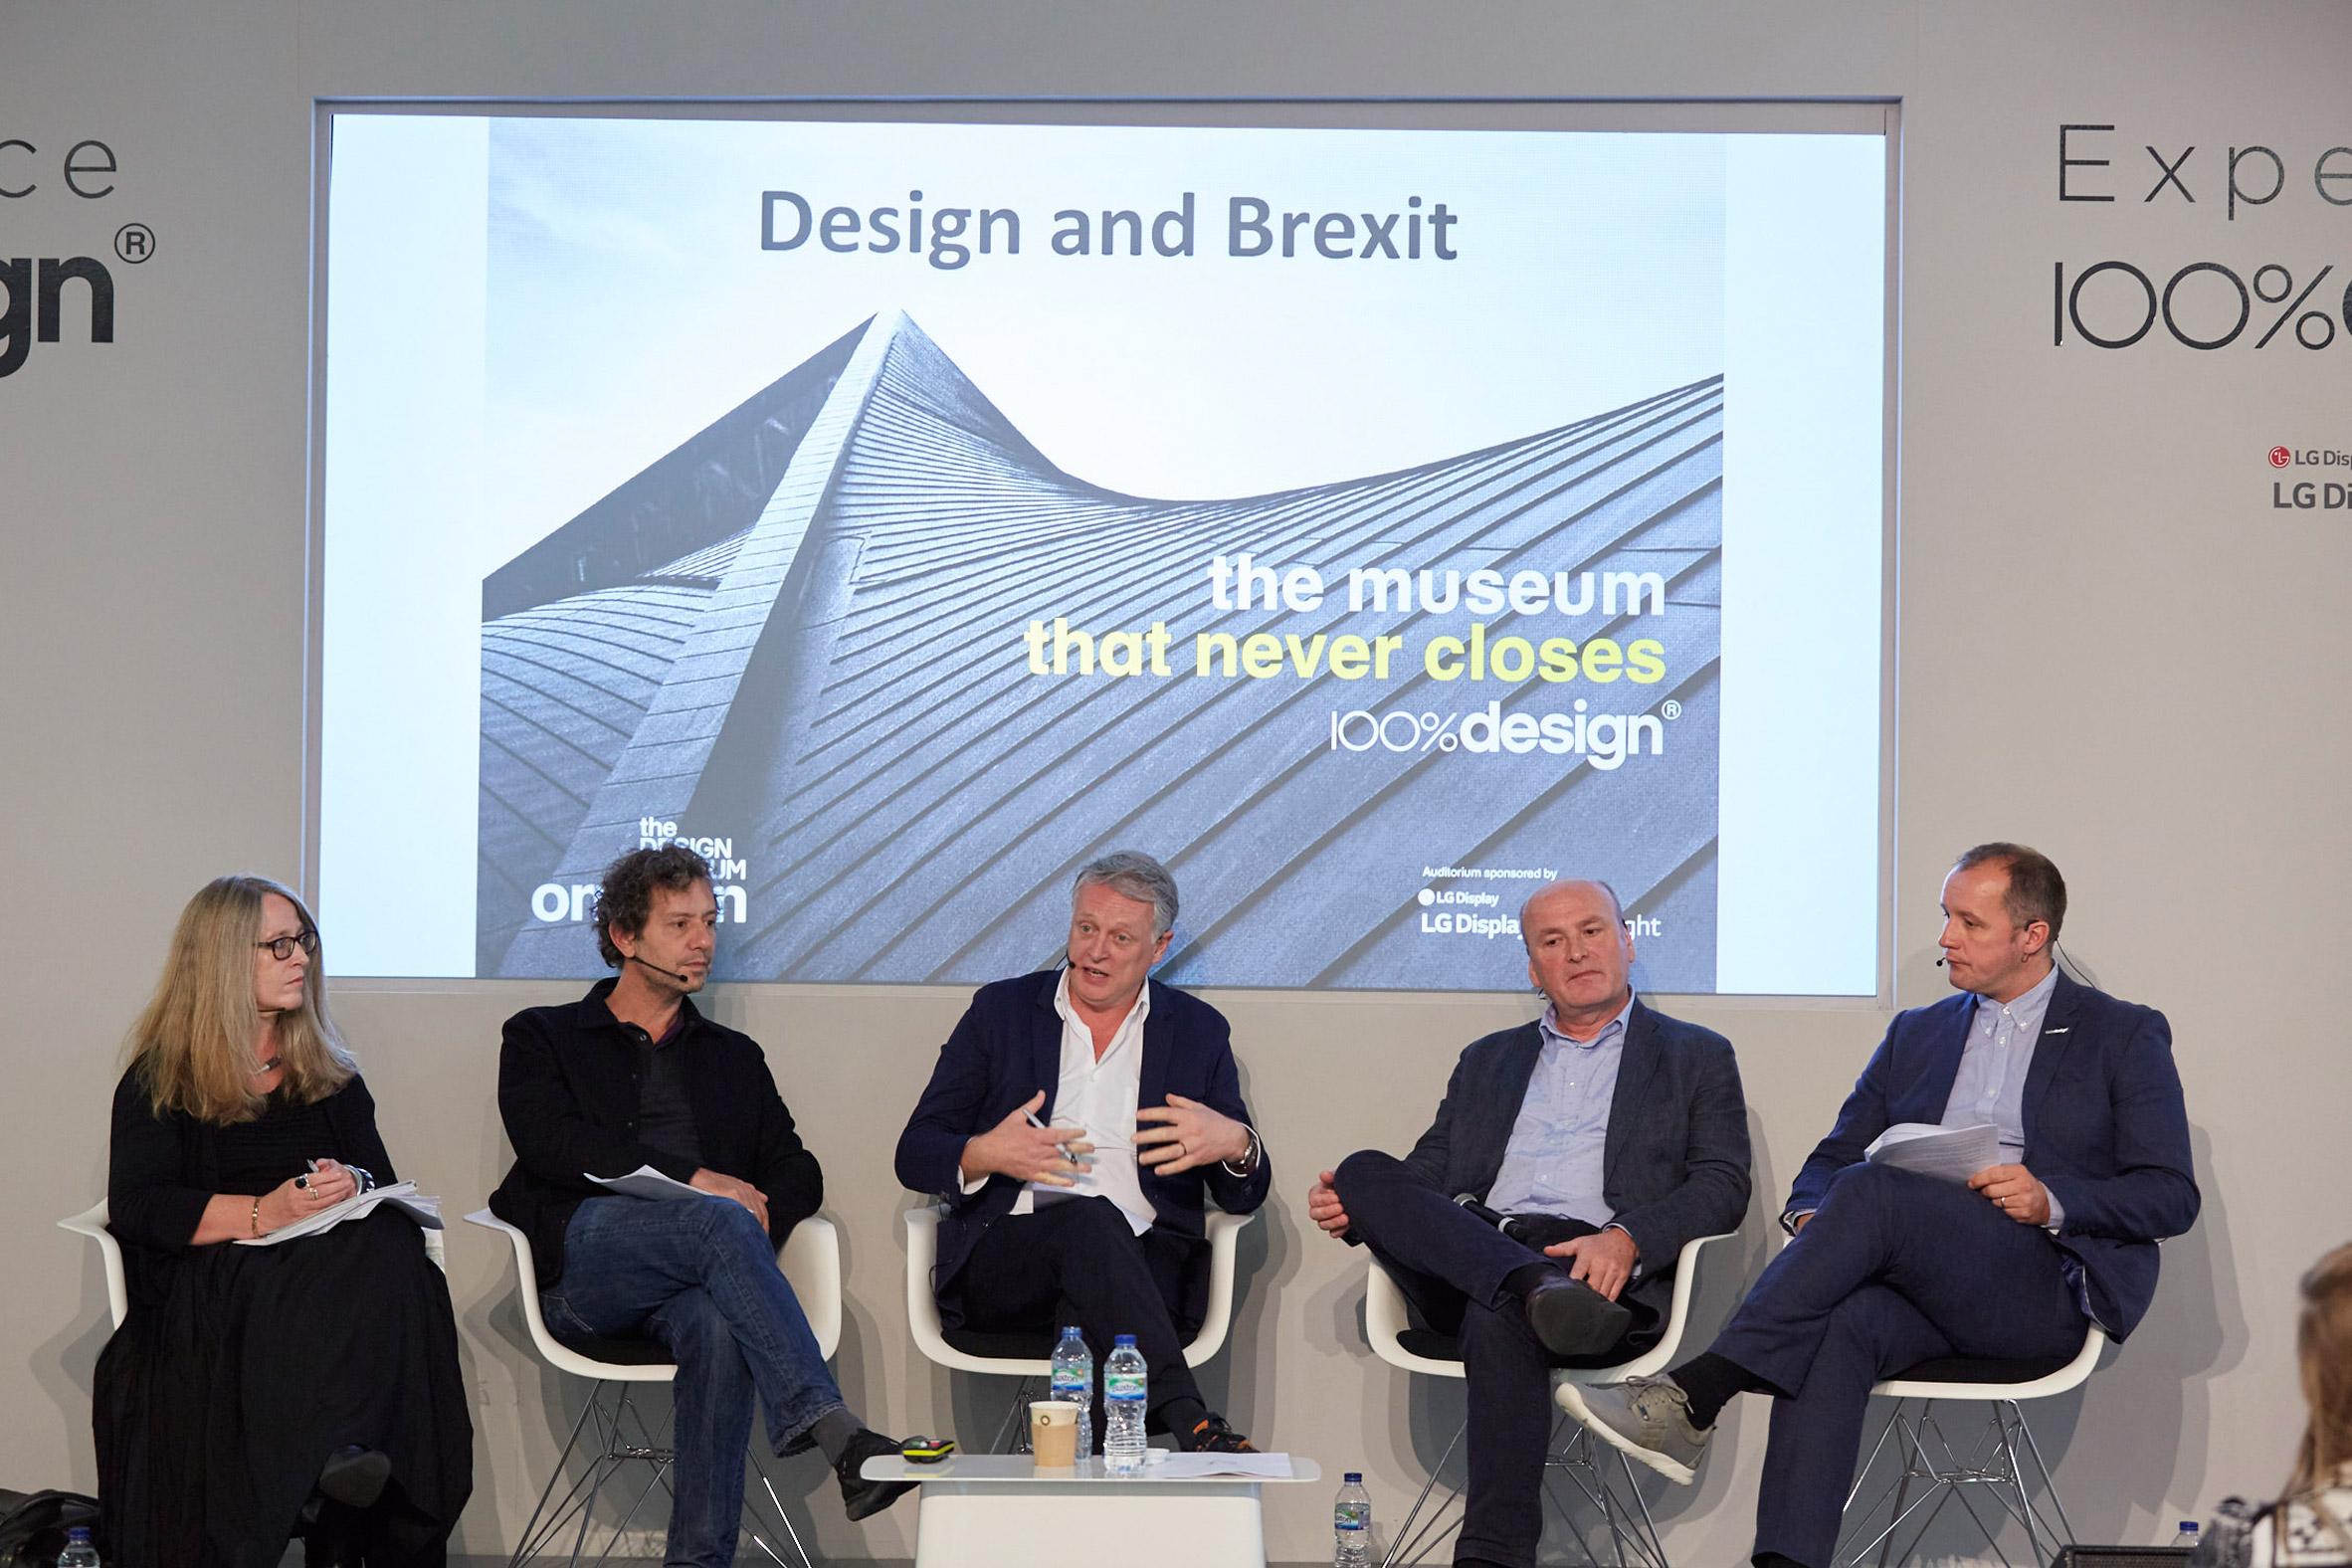 Ben Evans (centre) in a panel discussion about Brexit during London Design Festival